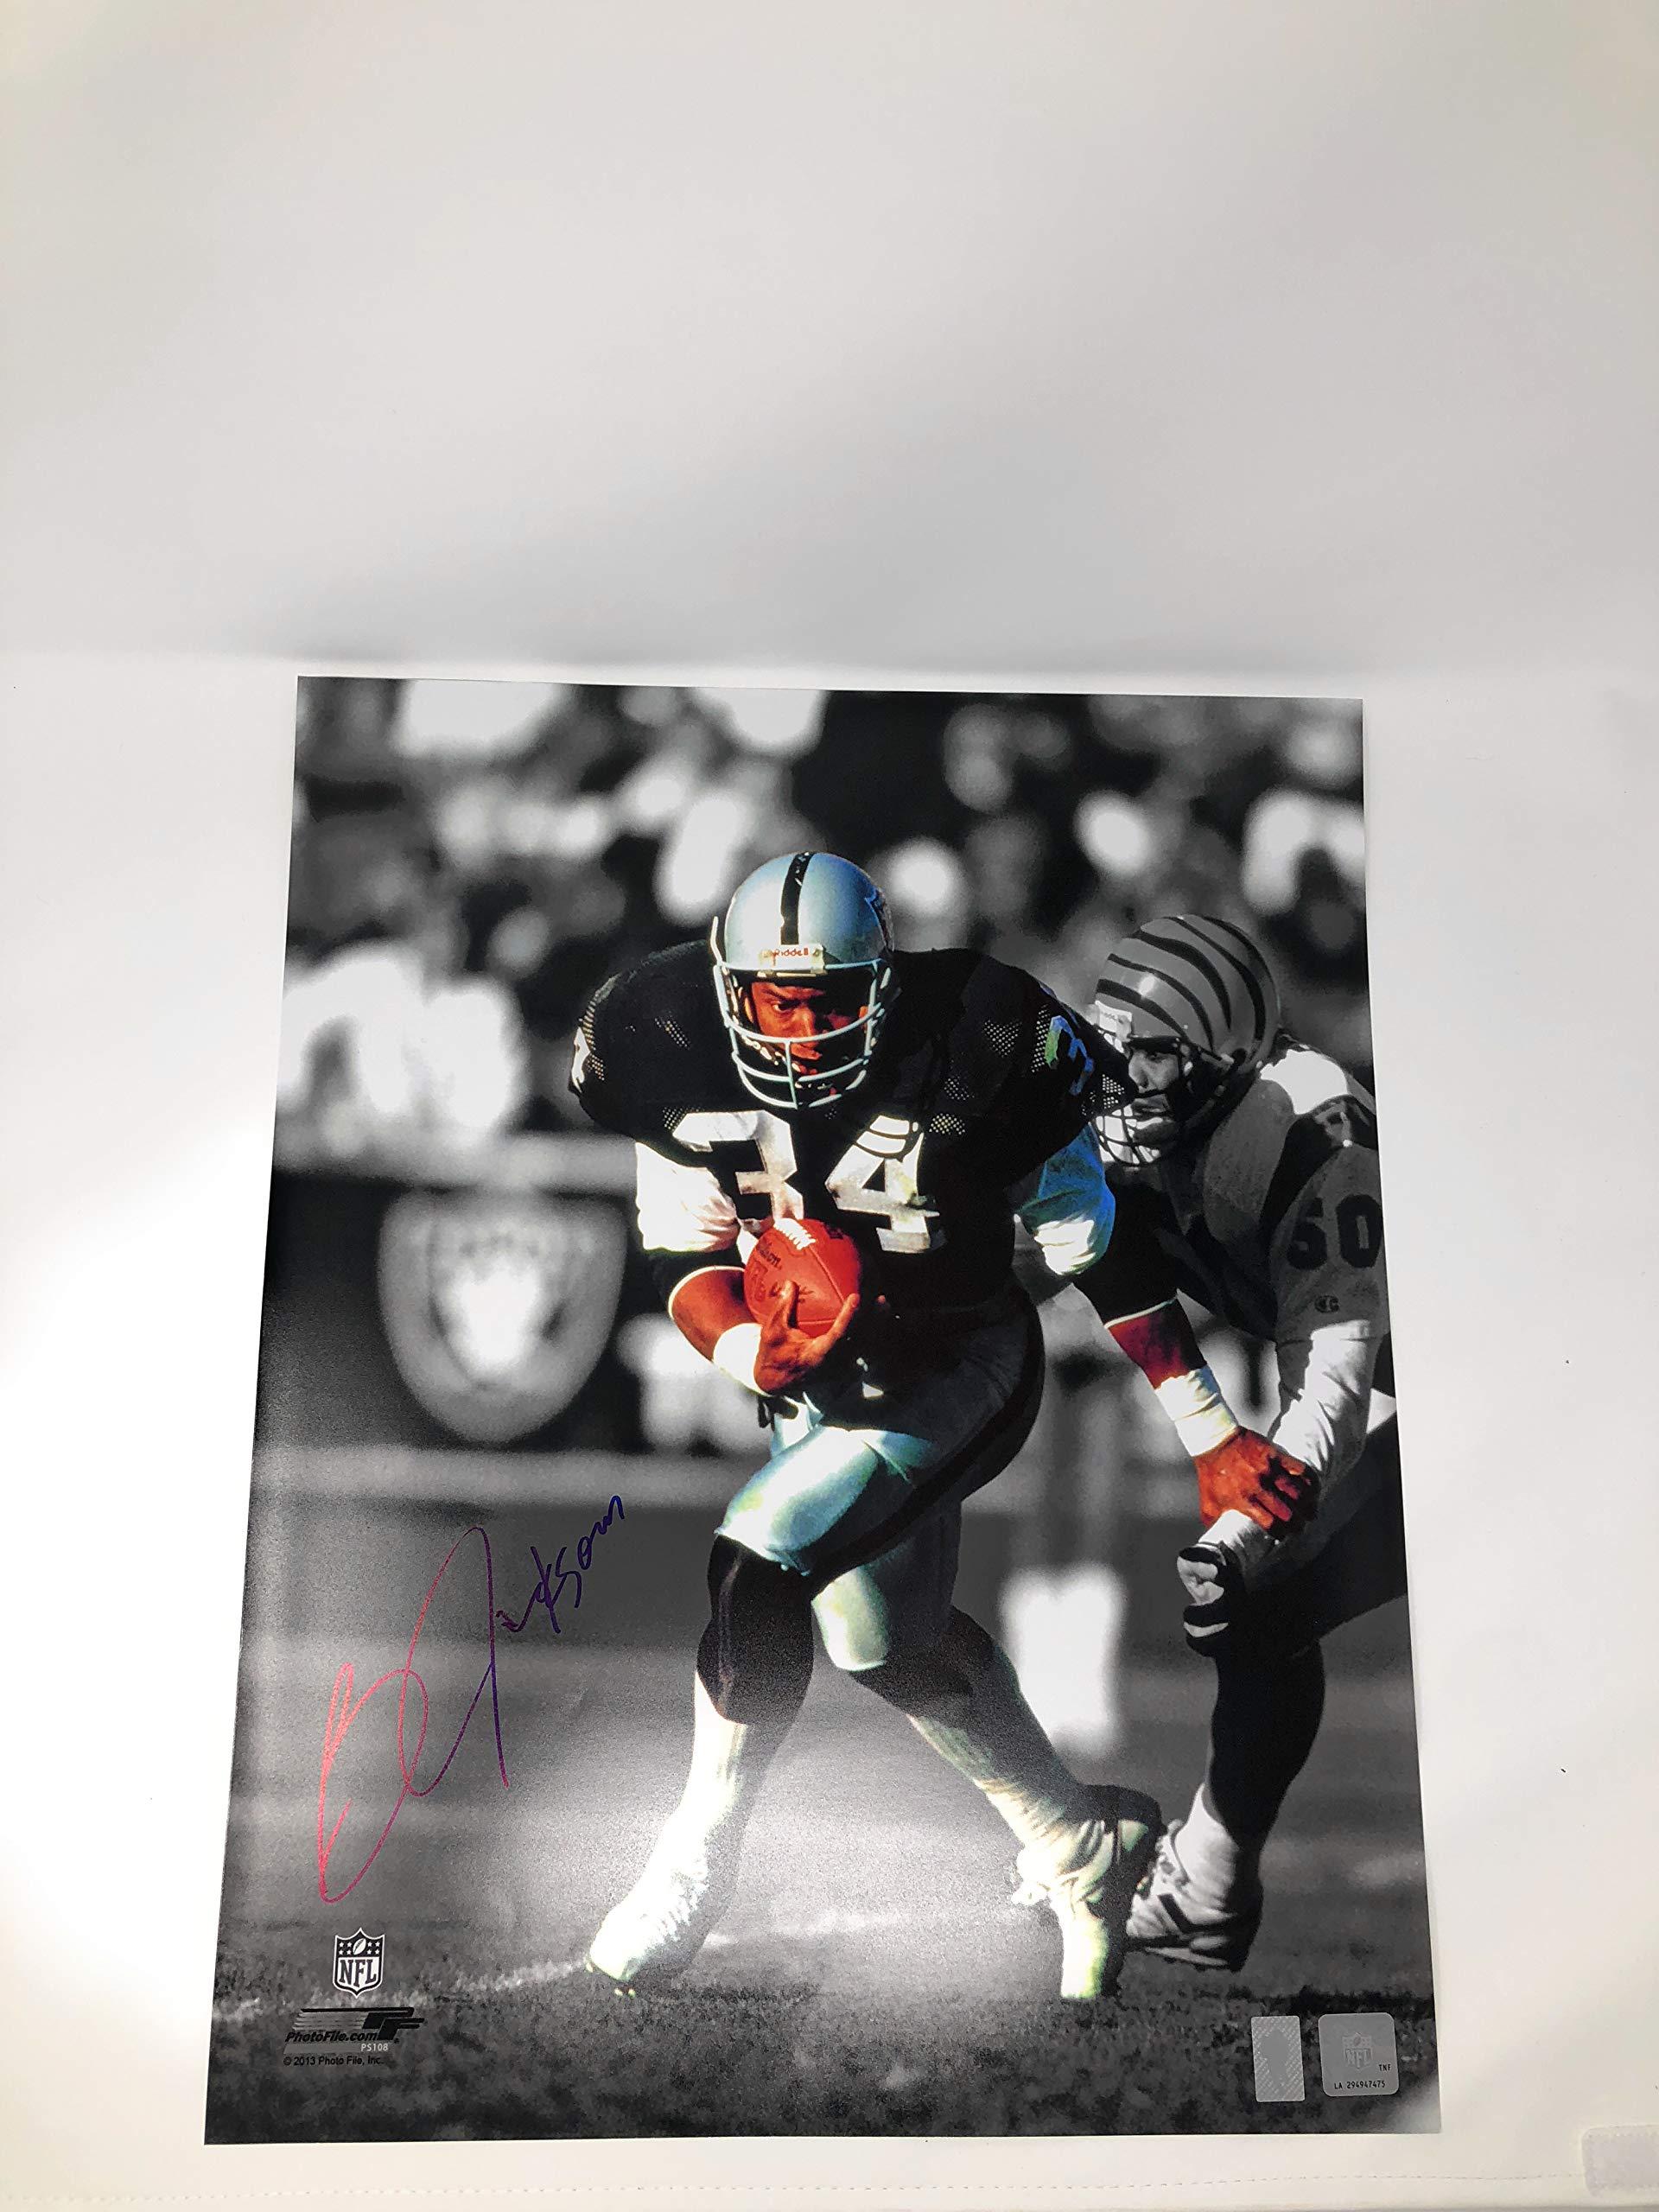 Bo Jackson Oakland Raiders Signed Autograph 16x20 Photo Photograph Spotlight GTSM Jackson Player Hologram Certified